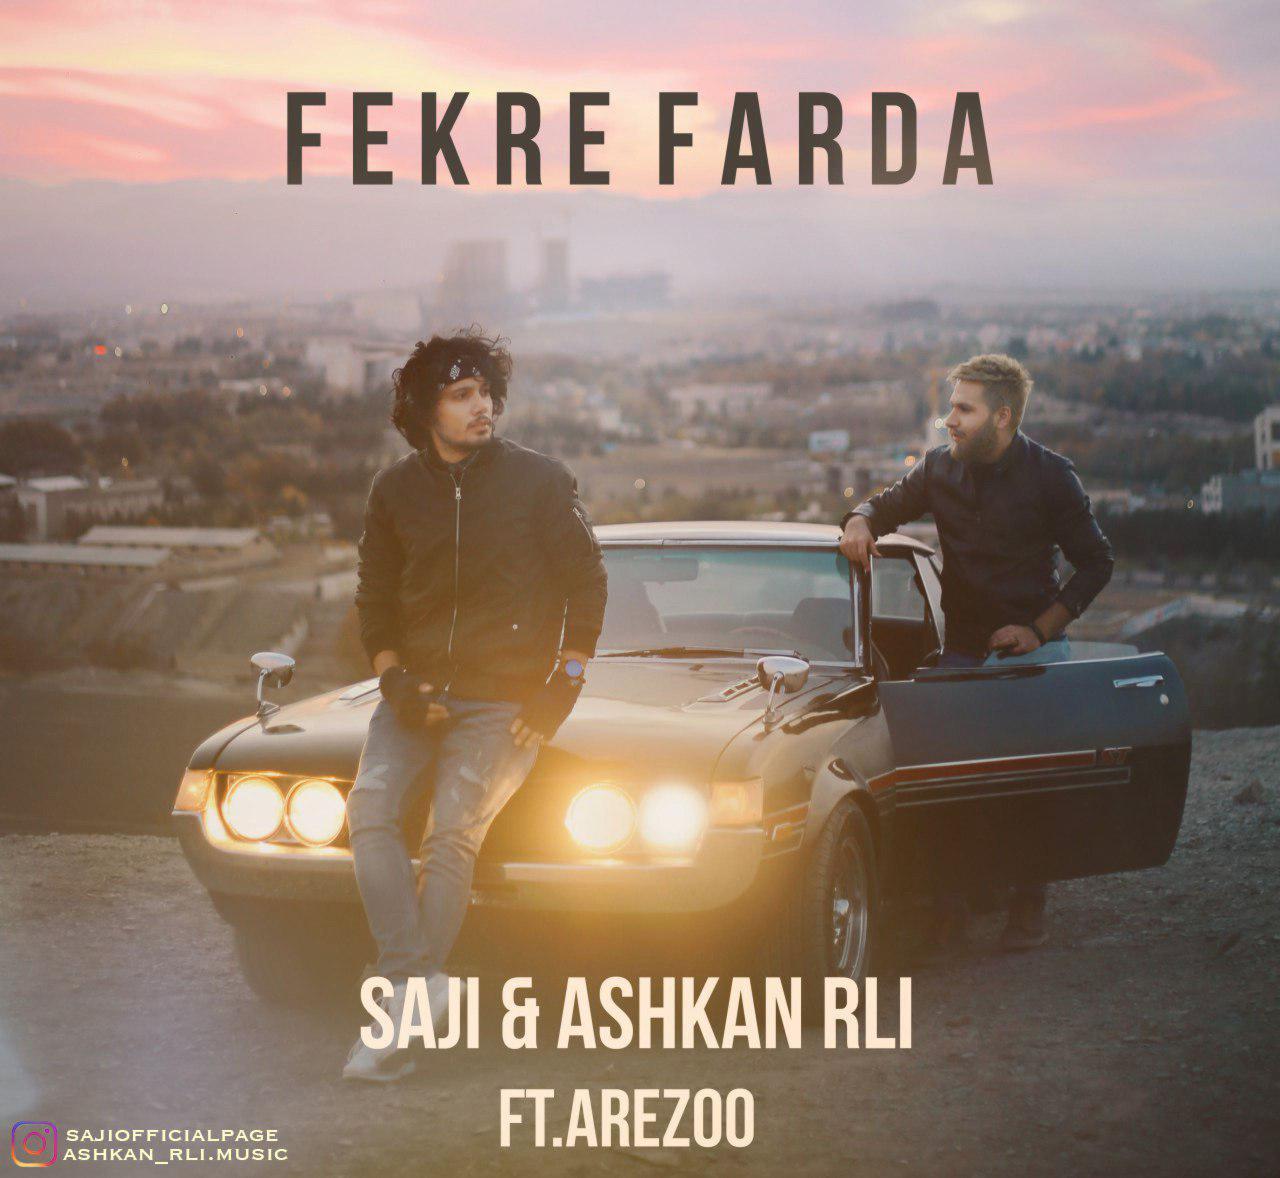 Saji & Ashkan Rli - Fekre Farda